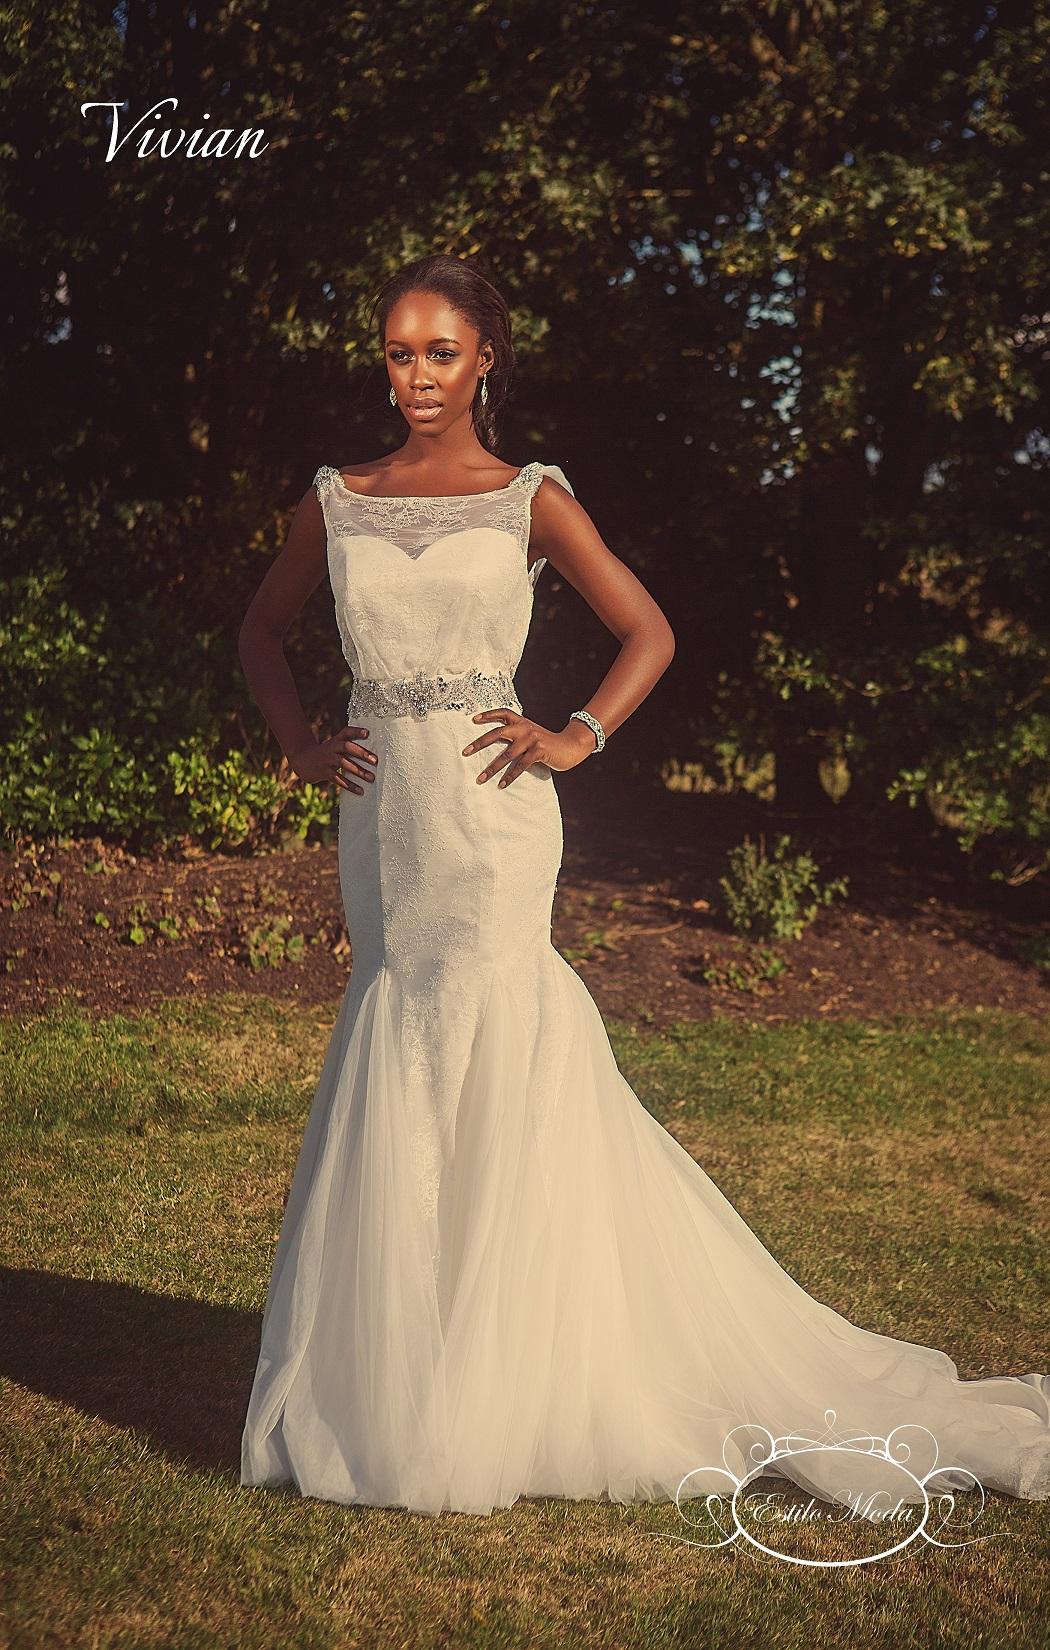 Vivian - Lace Mermaid Wedding Dress